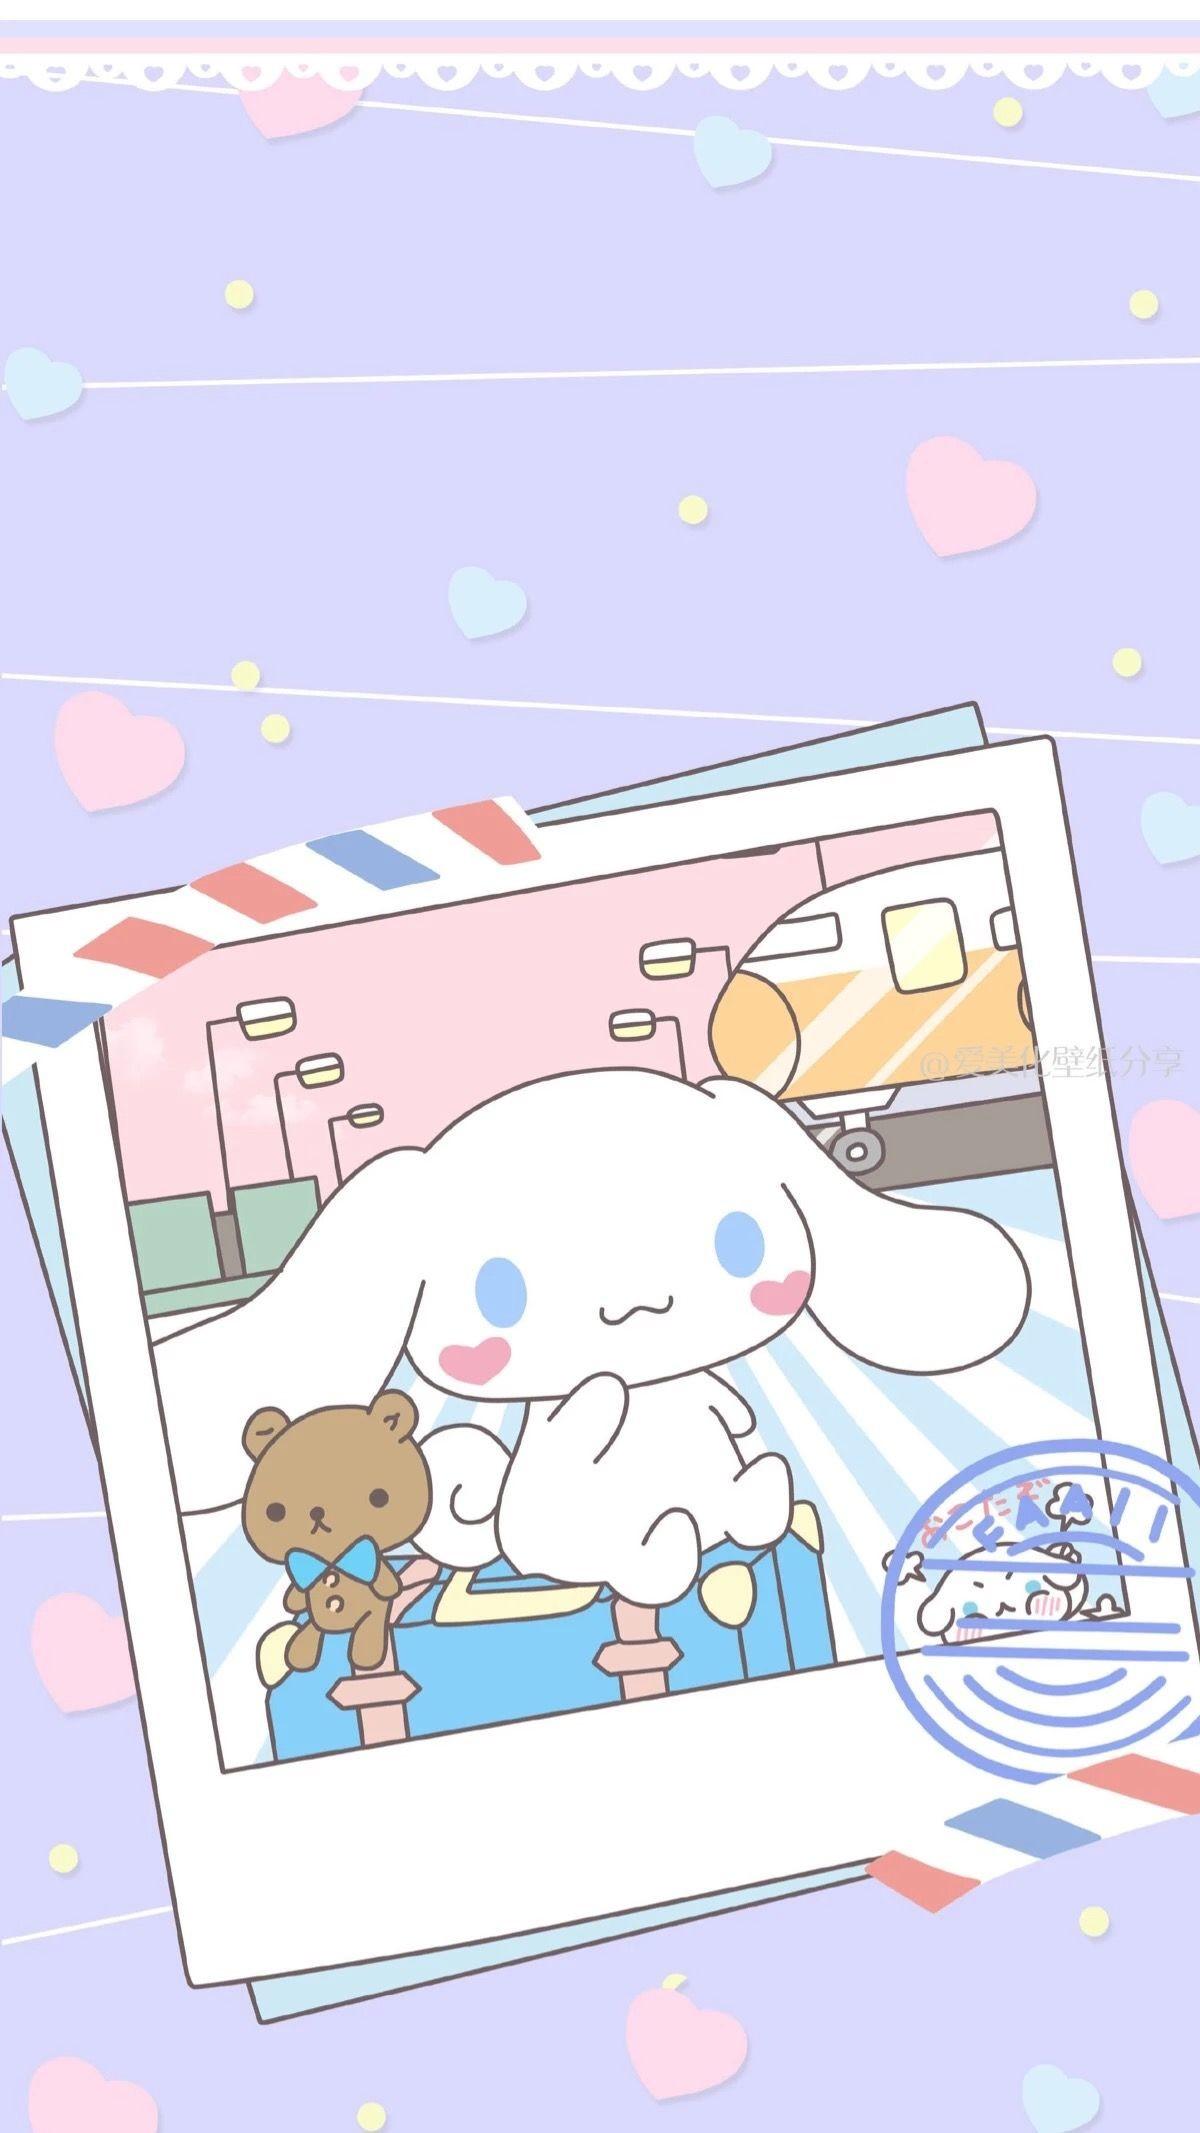 Res: 1200x2133, Kawaii Wallpaper, Sanrio Wallpaper, Kawaii Things, Cinnamon, Iphone  Wallpapers, Anime Art, Hello Kitty, Rainbow, Fabrics